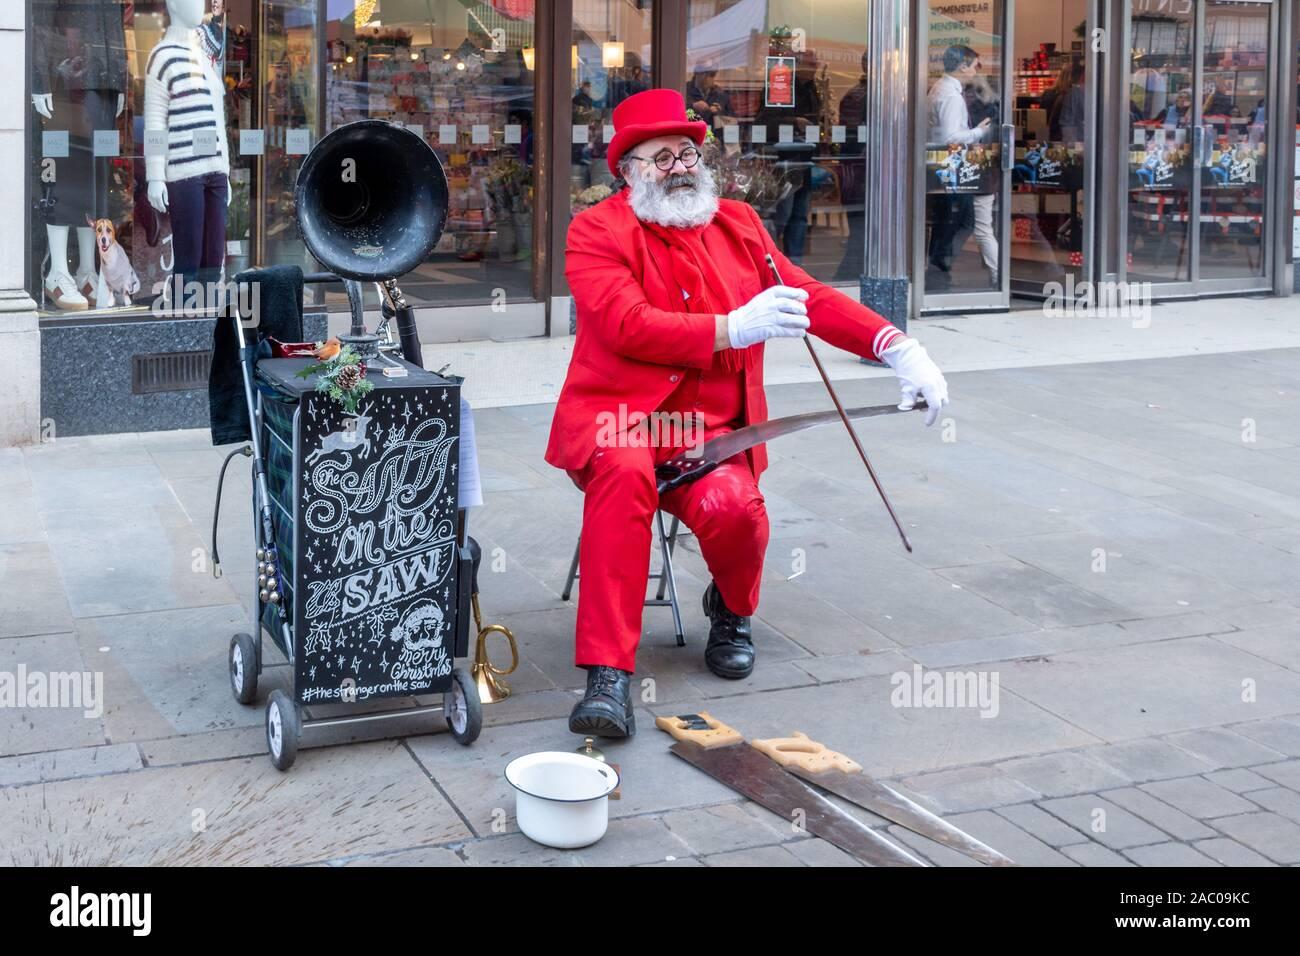 santa-on-the-saw-musician-busker-on-high-street-christmas-entertainment-uk-2AC09KC.jpg